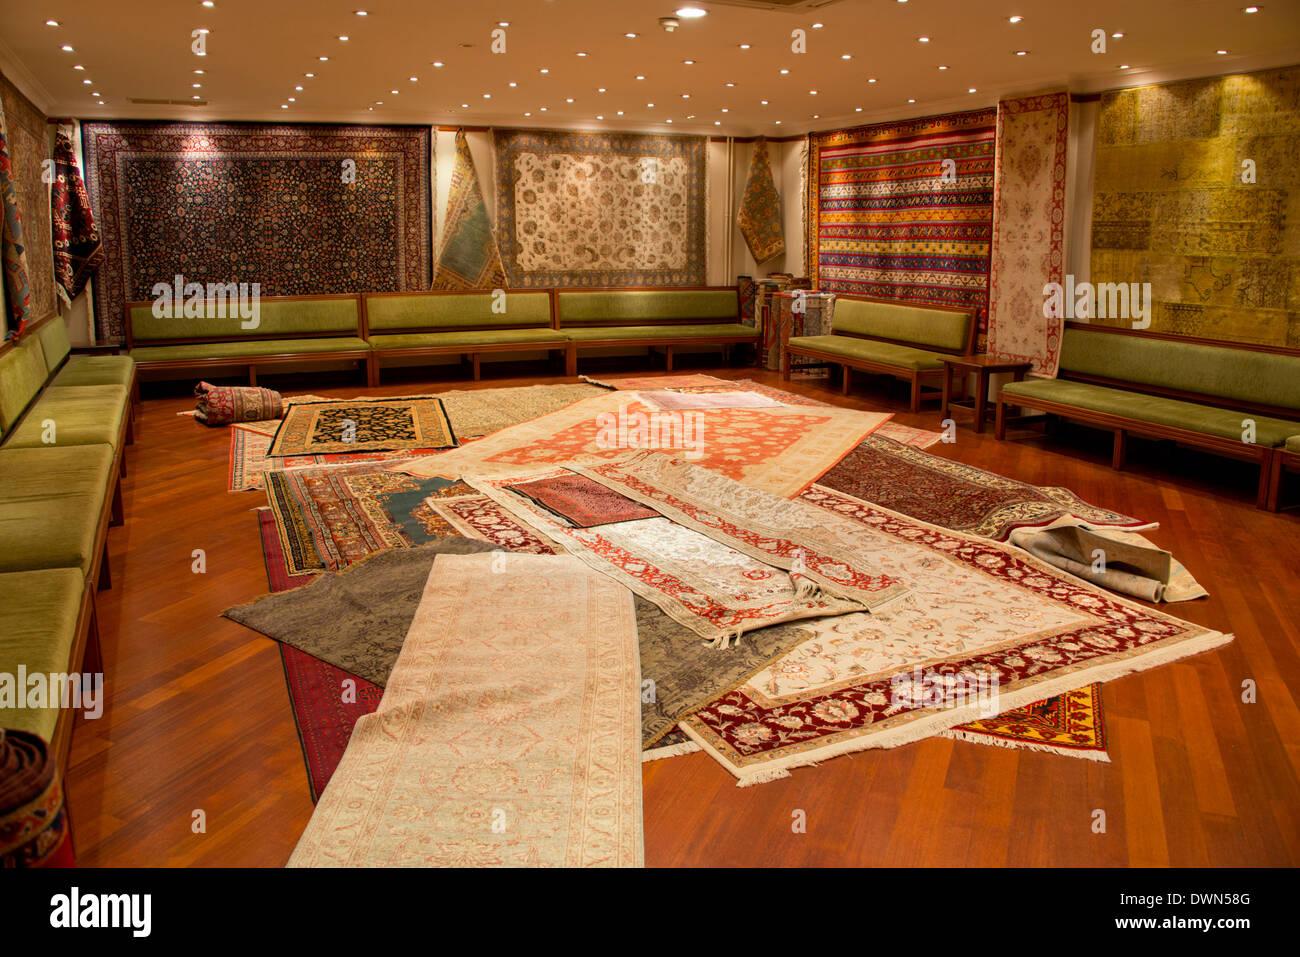 Typical Turkish Carpet Workshop And Showroom